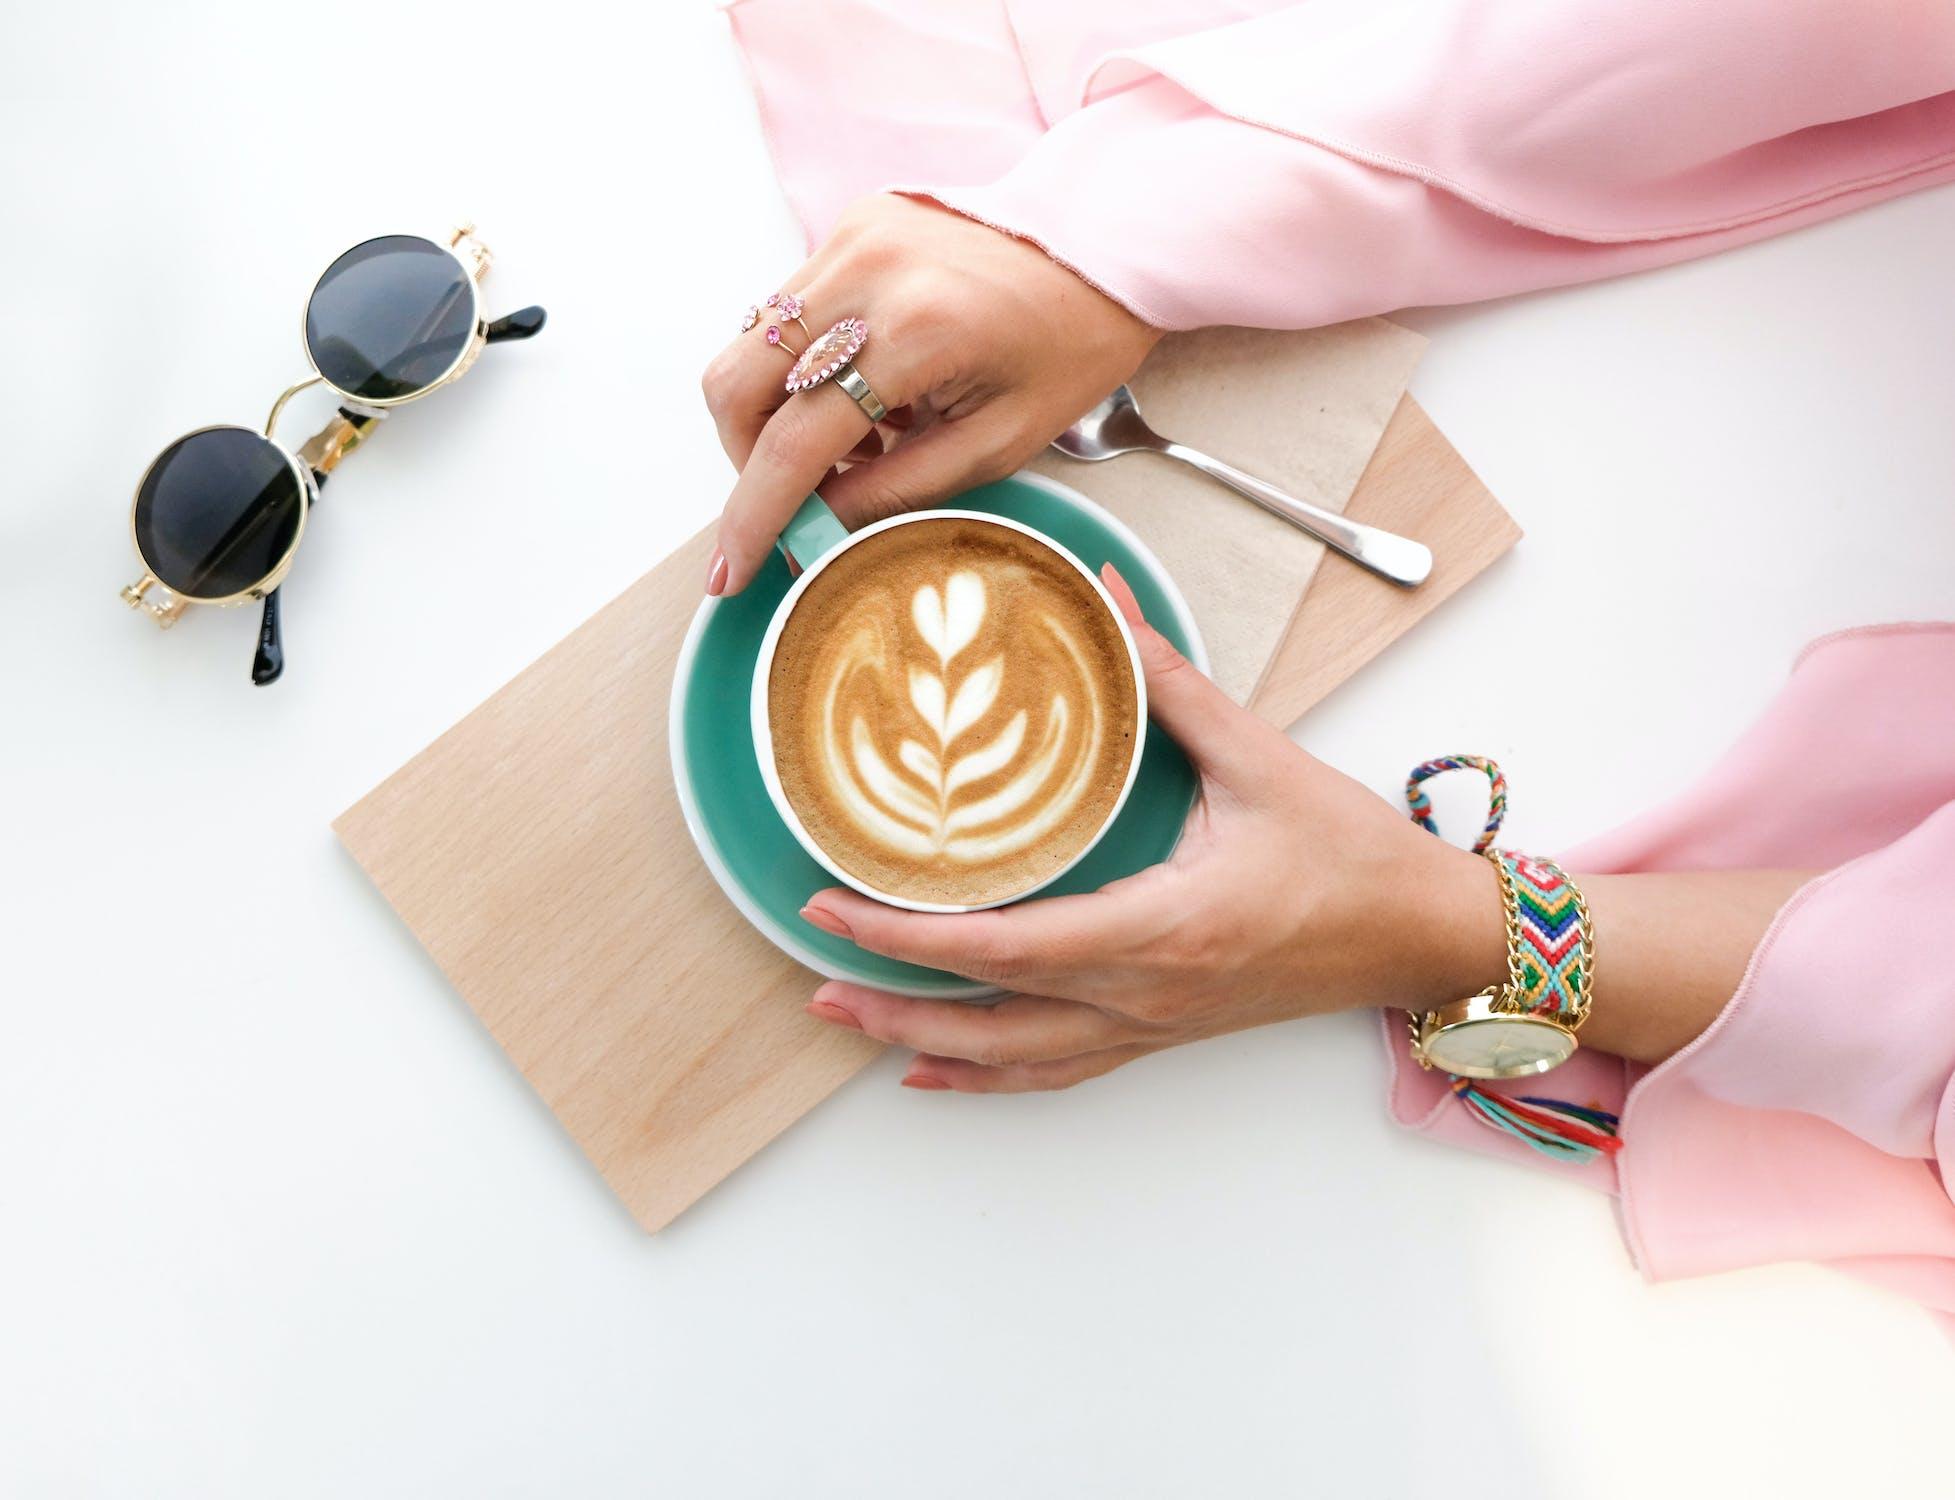 Coffee, Cup, Macbook, Laptop, Working, Breakfast, Bed